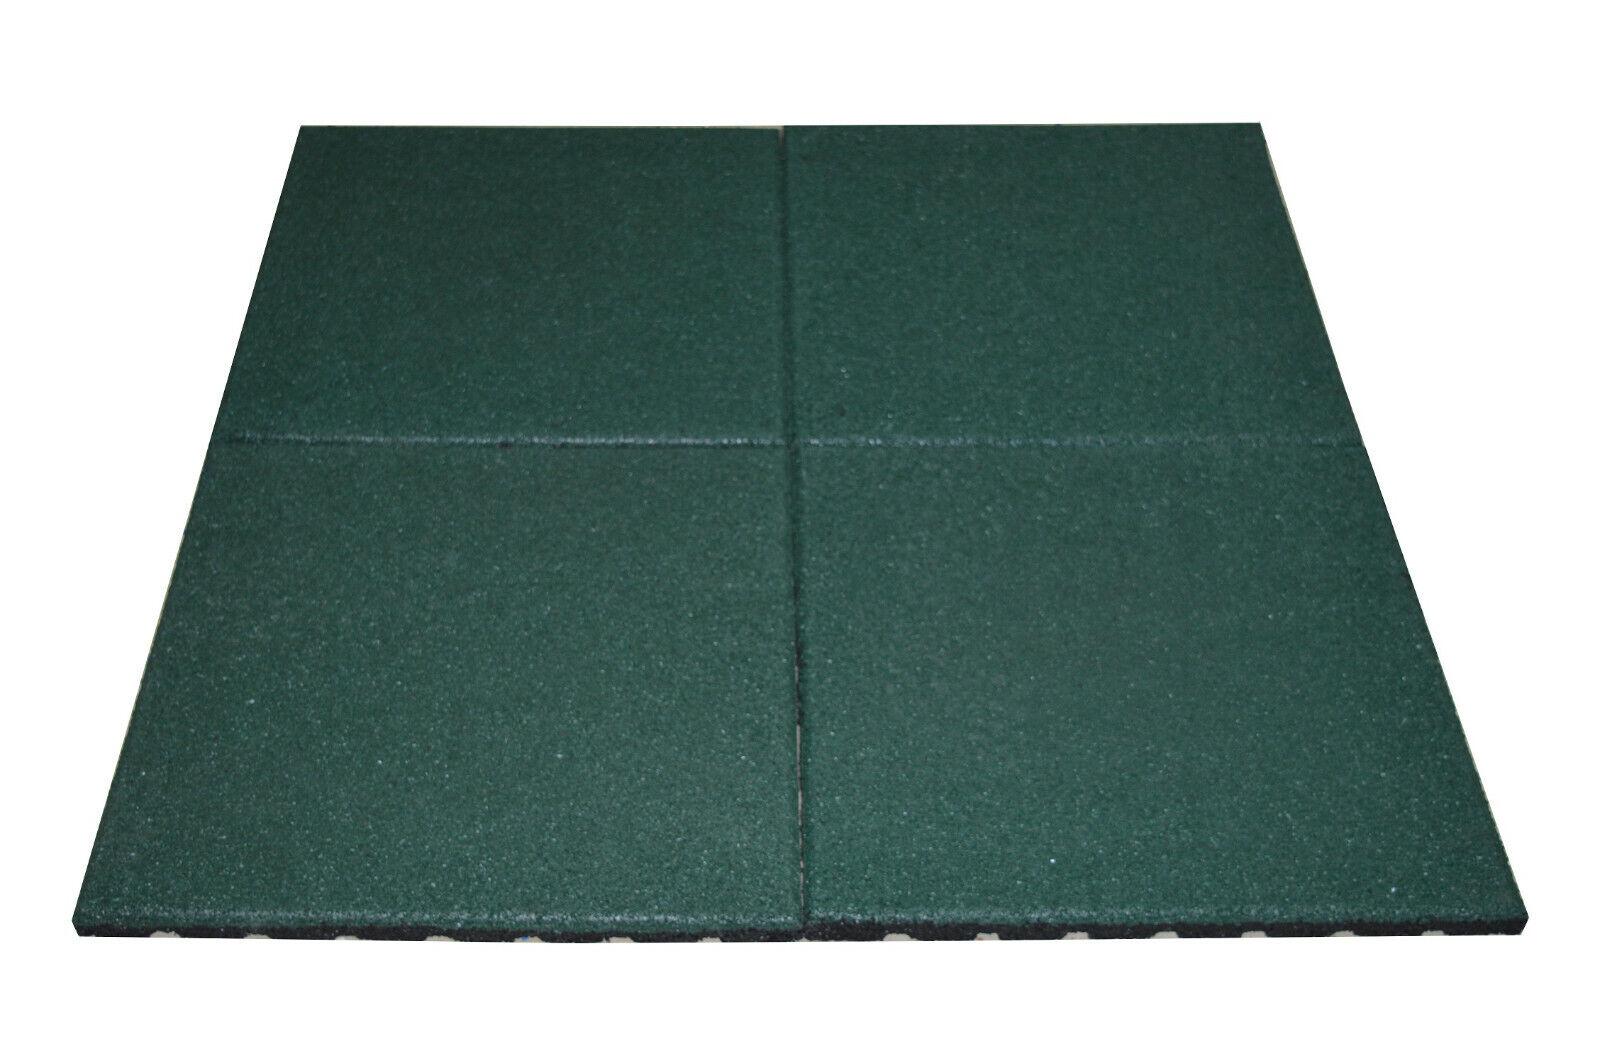 4X Fallschutzmatte (a 5kg) Grün  50x50x2,5cm Gummimatte Fallschutz Spielplatz